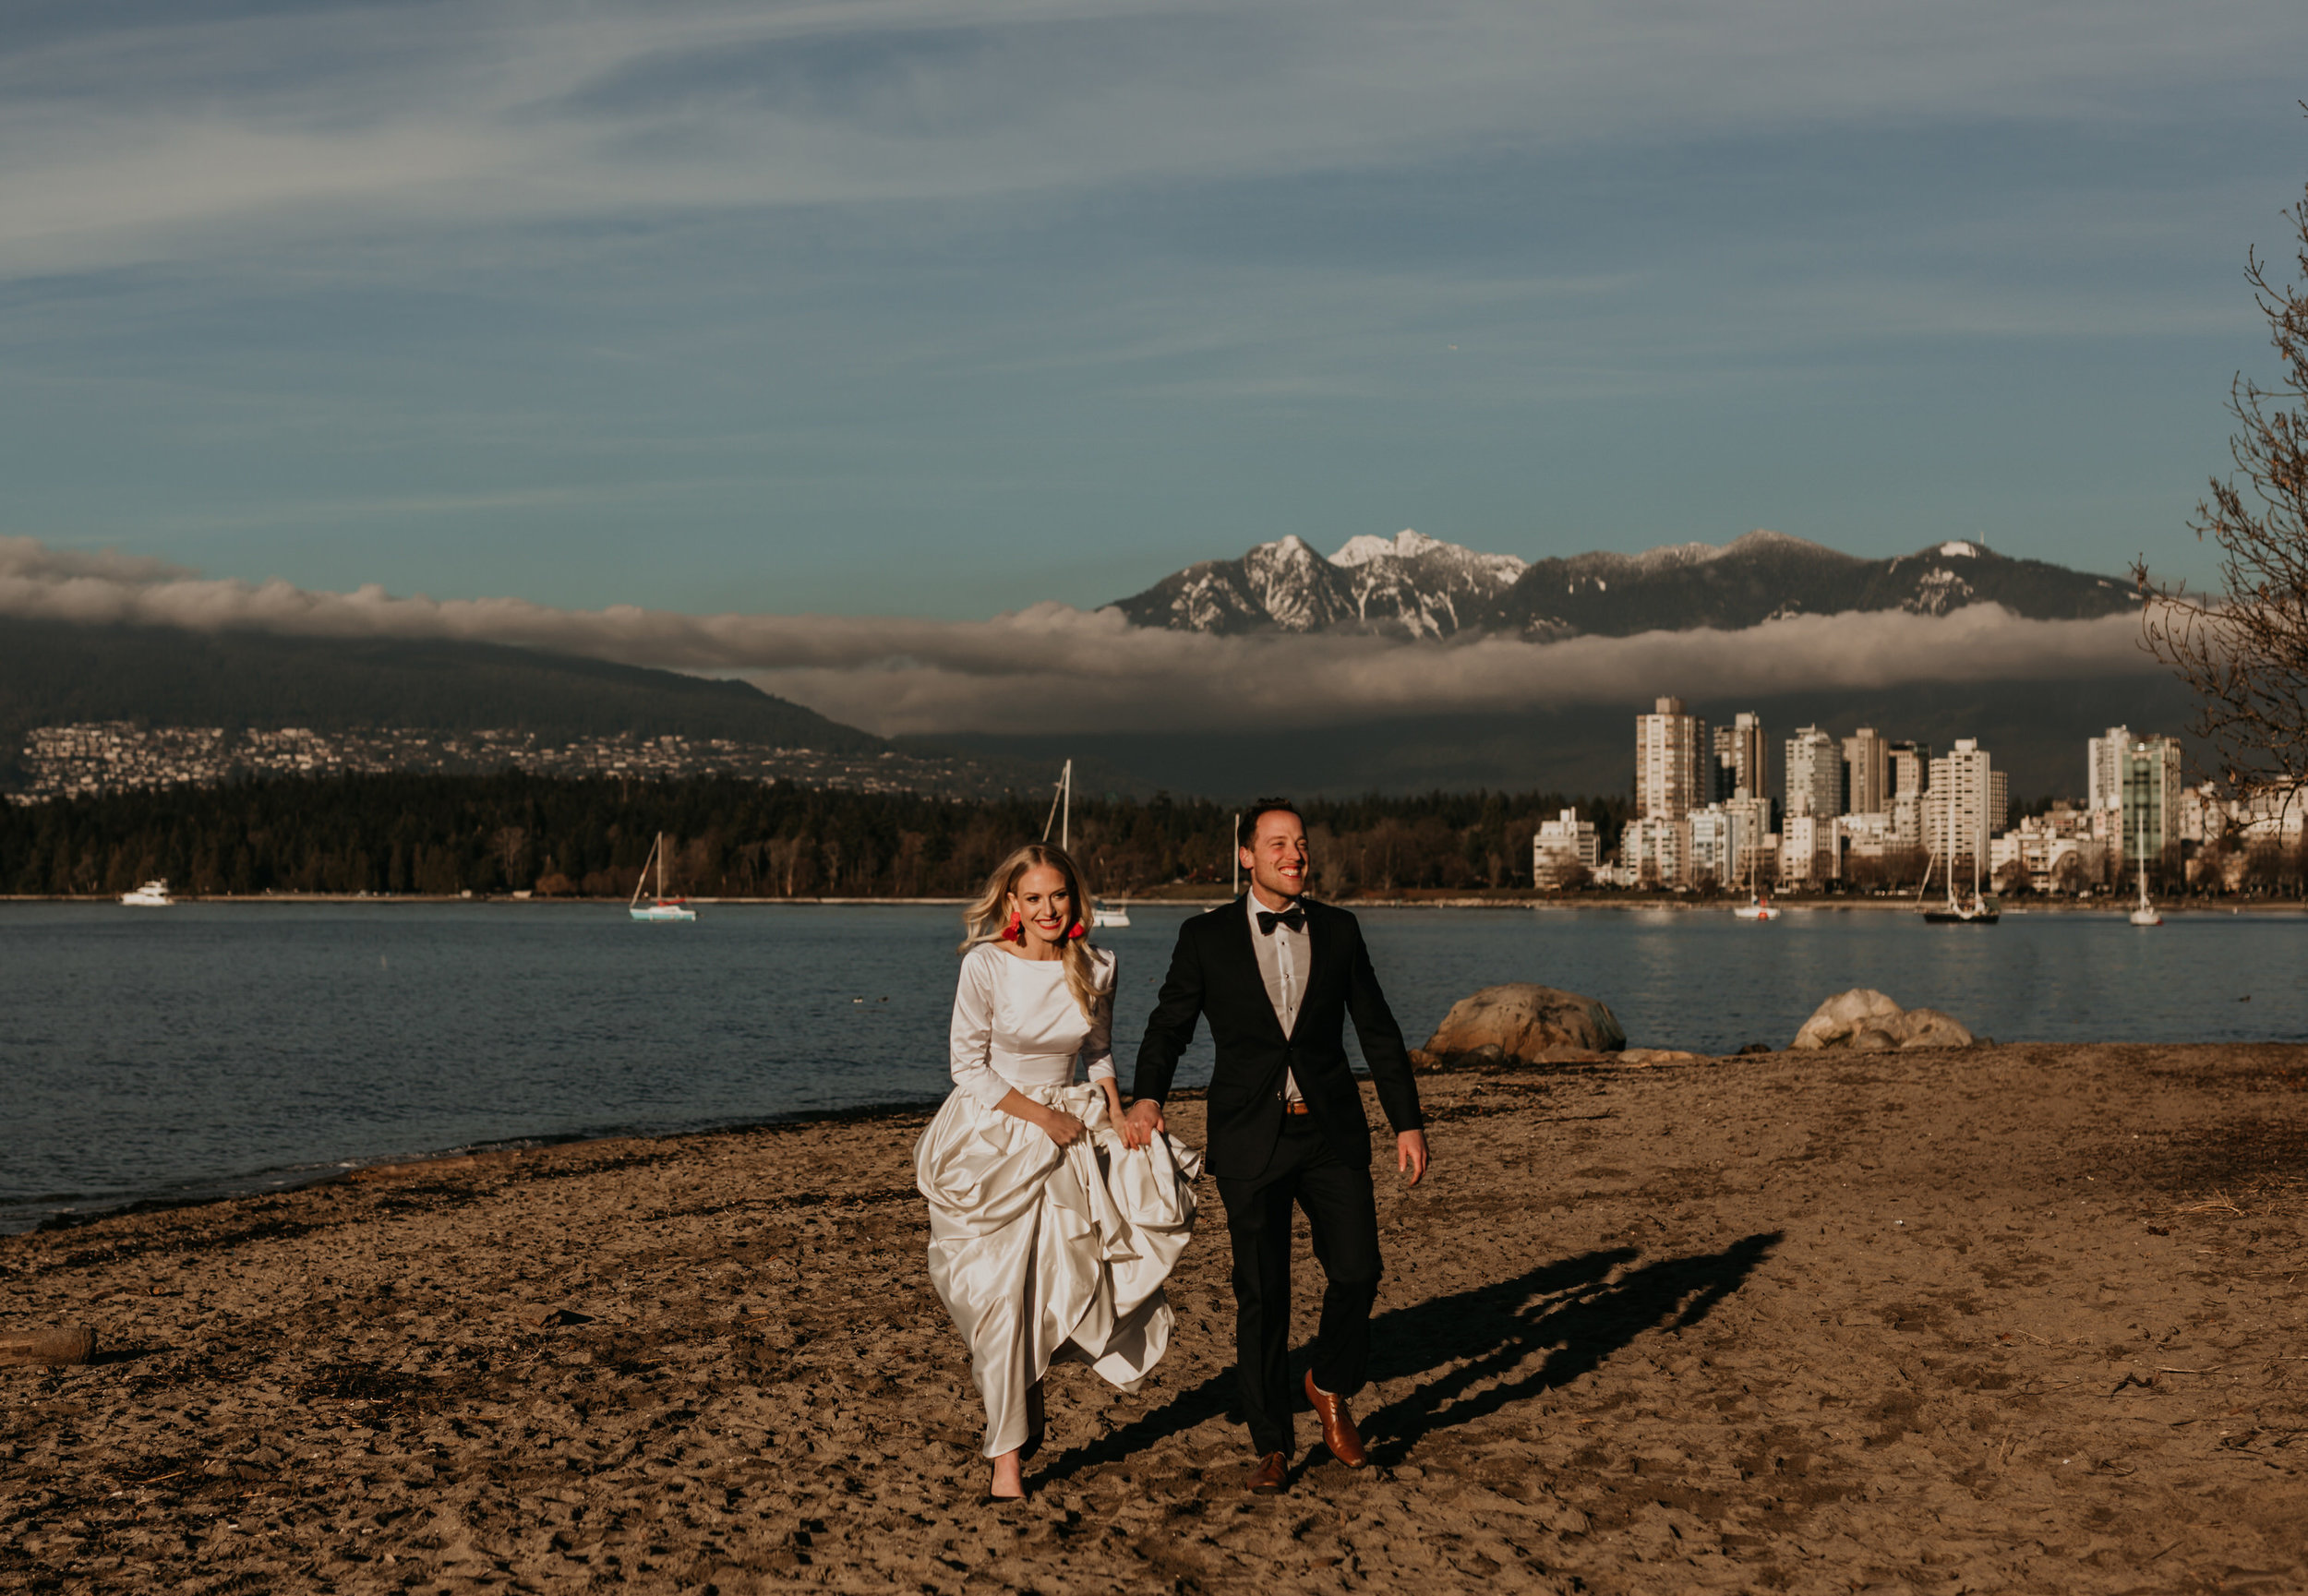 Vancouver Wedding Photos - Vegan Wedding Photographer - New Years Eve Wedding Photos - Vancouver Wedding Photographer - Vancouver Wedding Videographer - 604.JPG